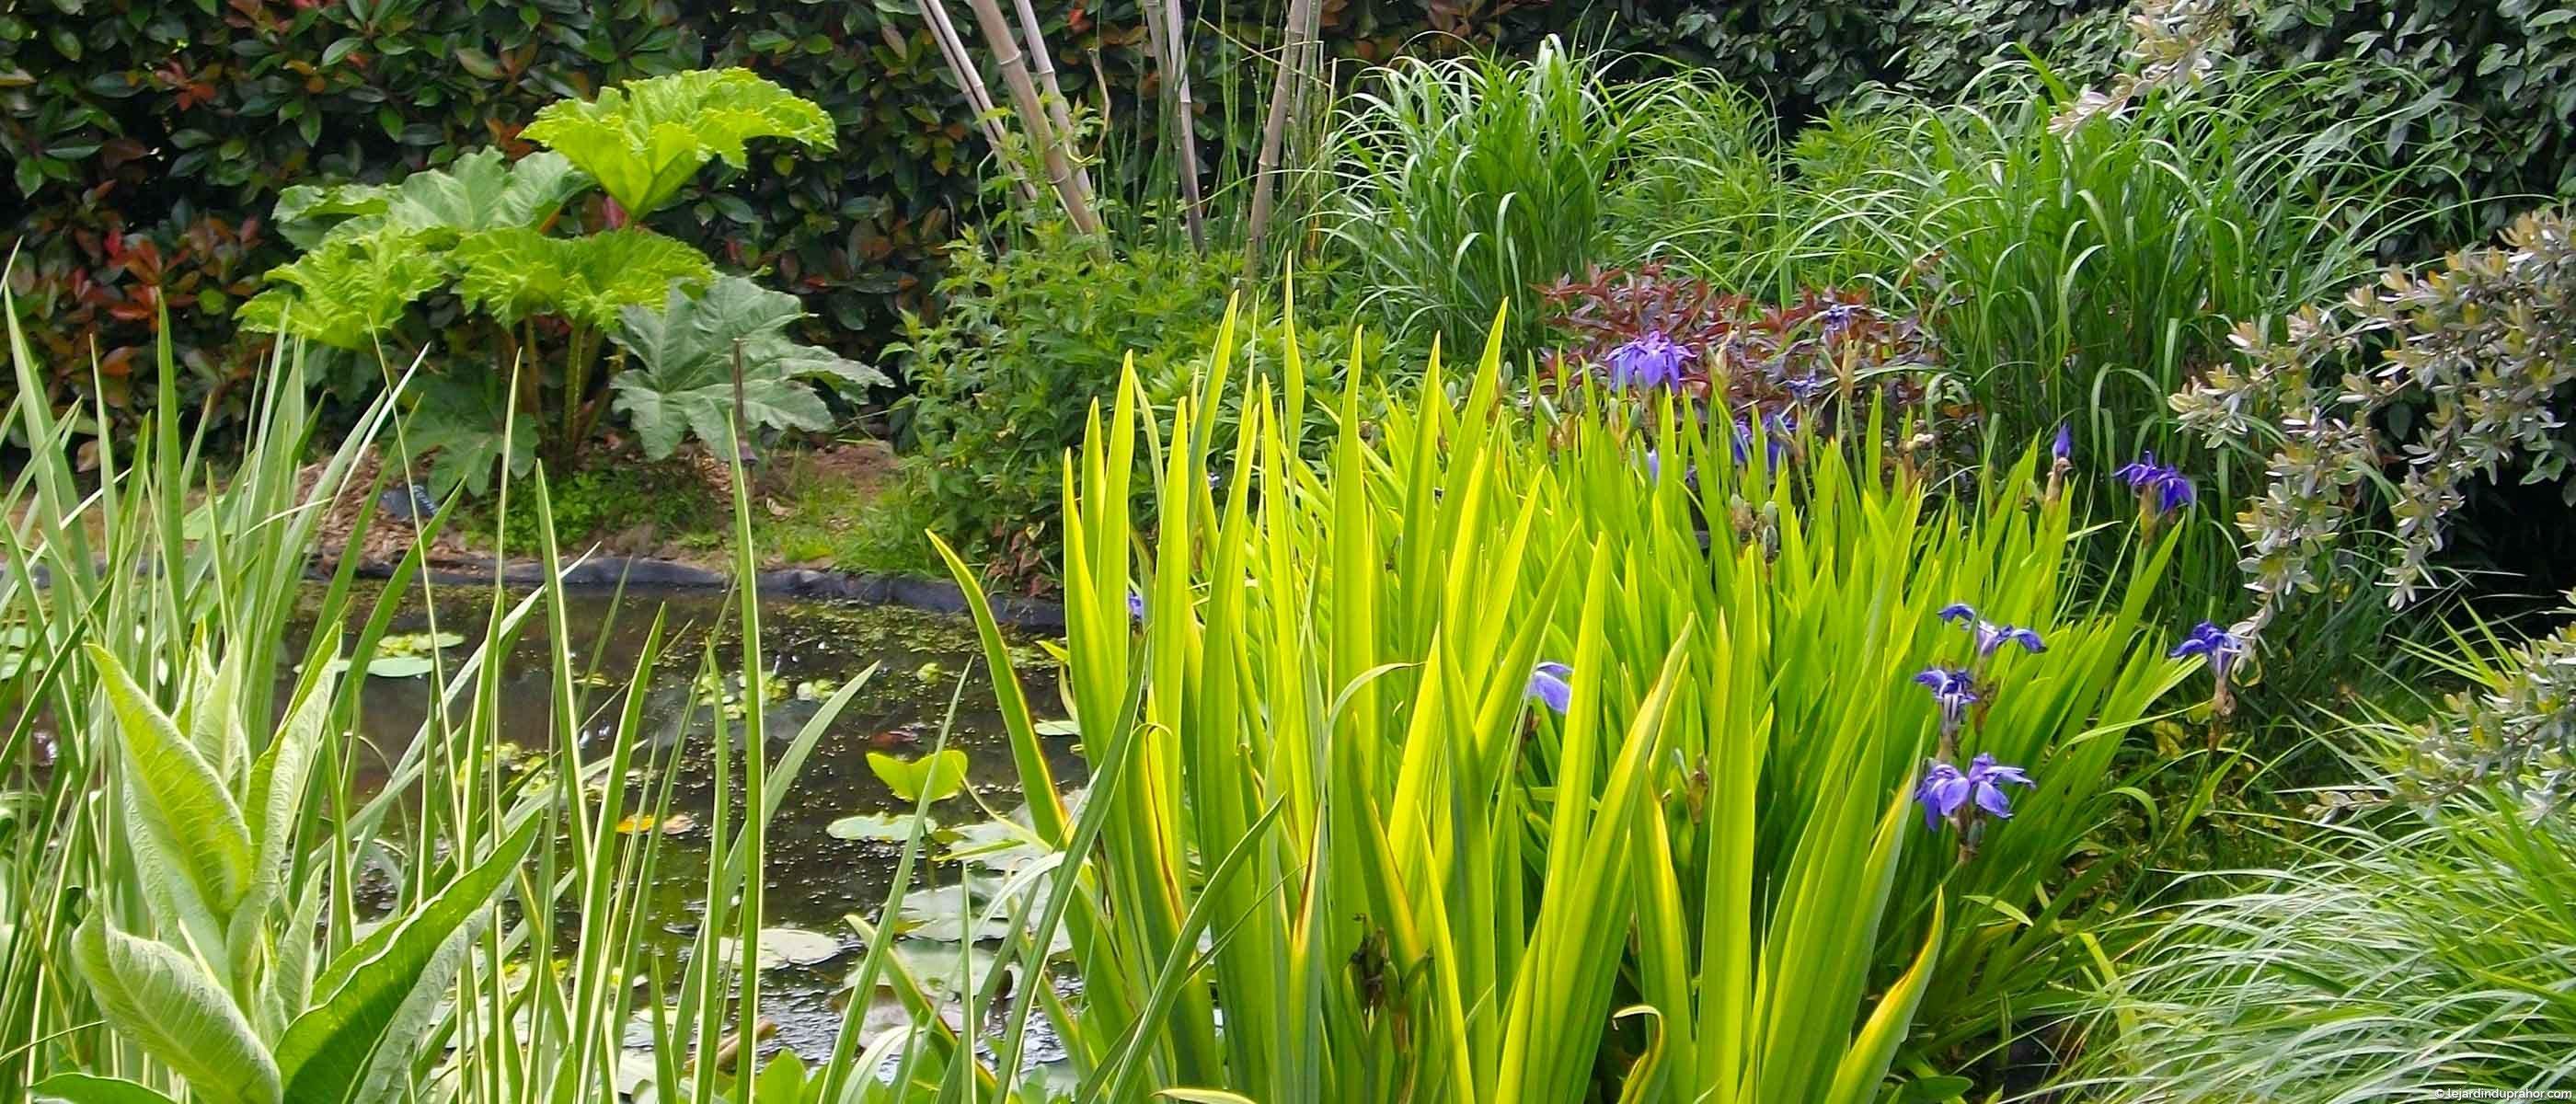 P pini re cologique et jardin visiter morbihan le for Jardin a visiter